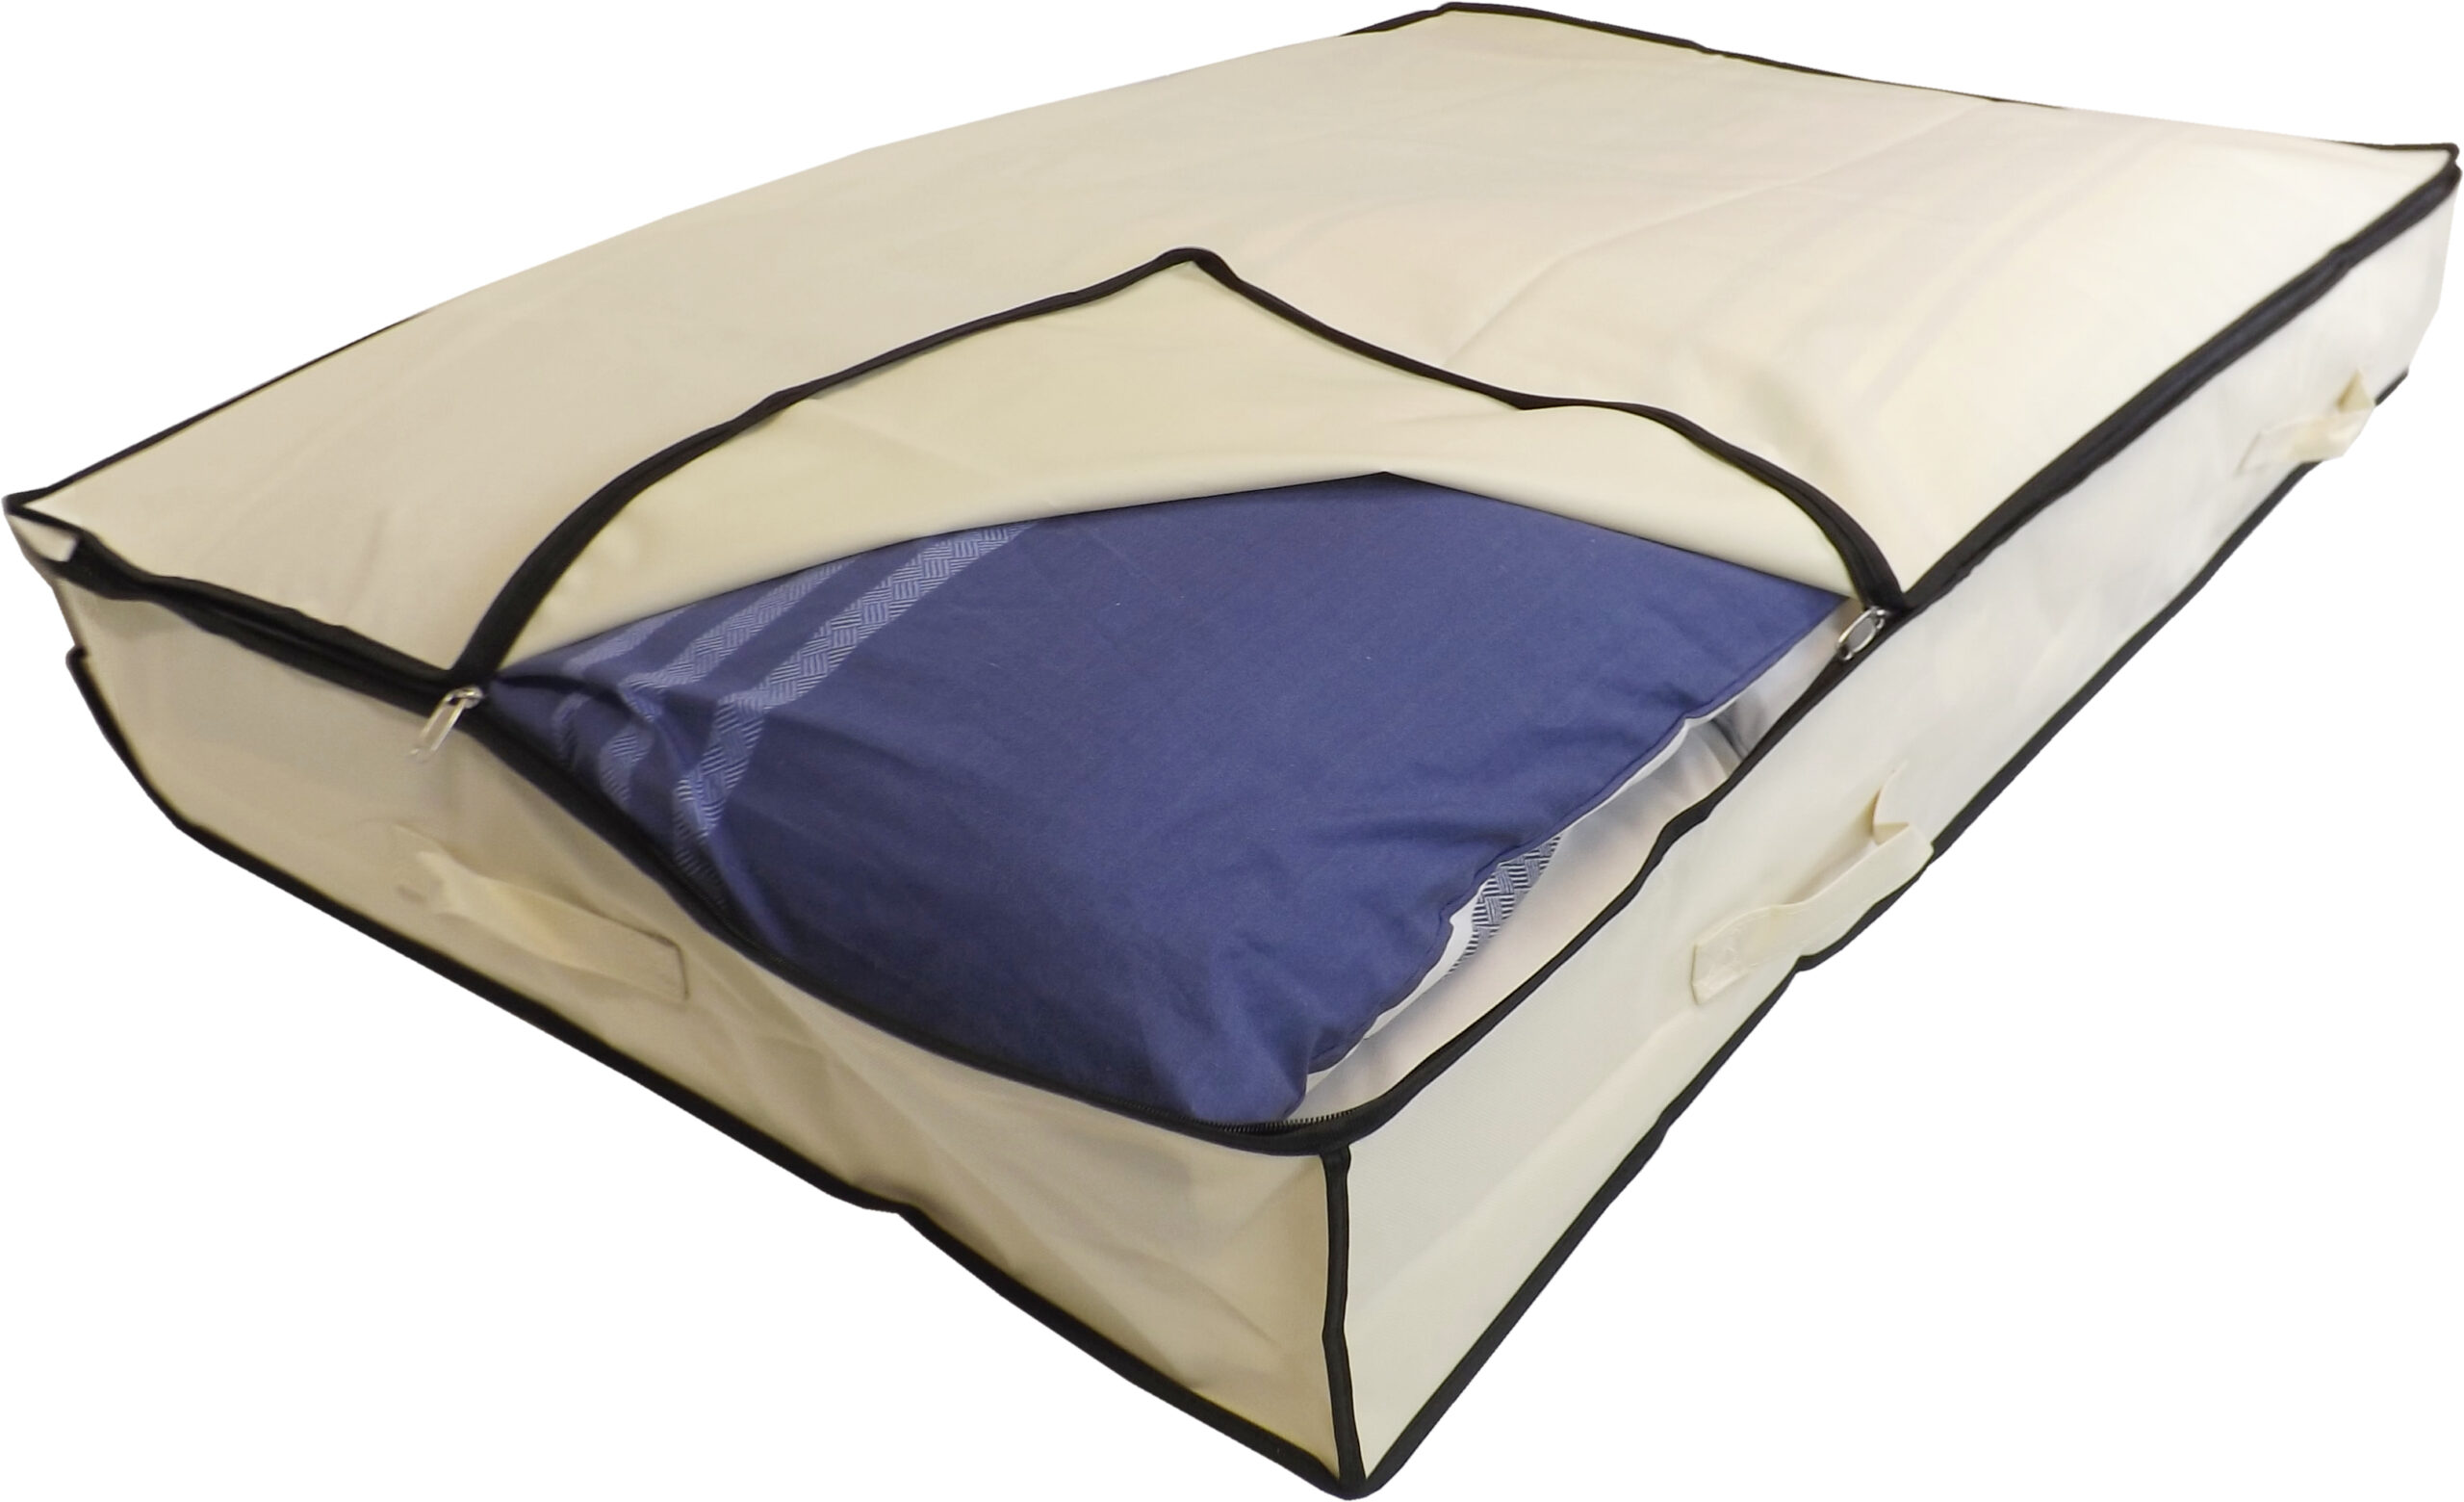 Extra Large Underbed Slimline Storage Bag, Heavy Duty, 150 Litre Capacity, 125x80x15cm, Beige